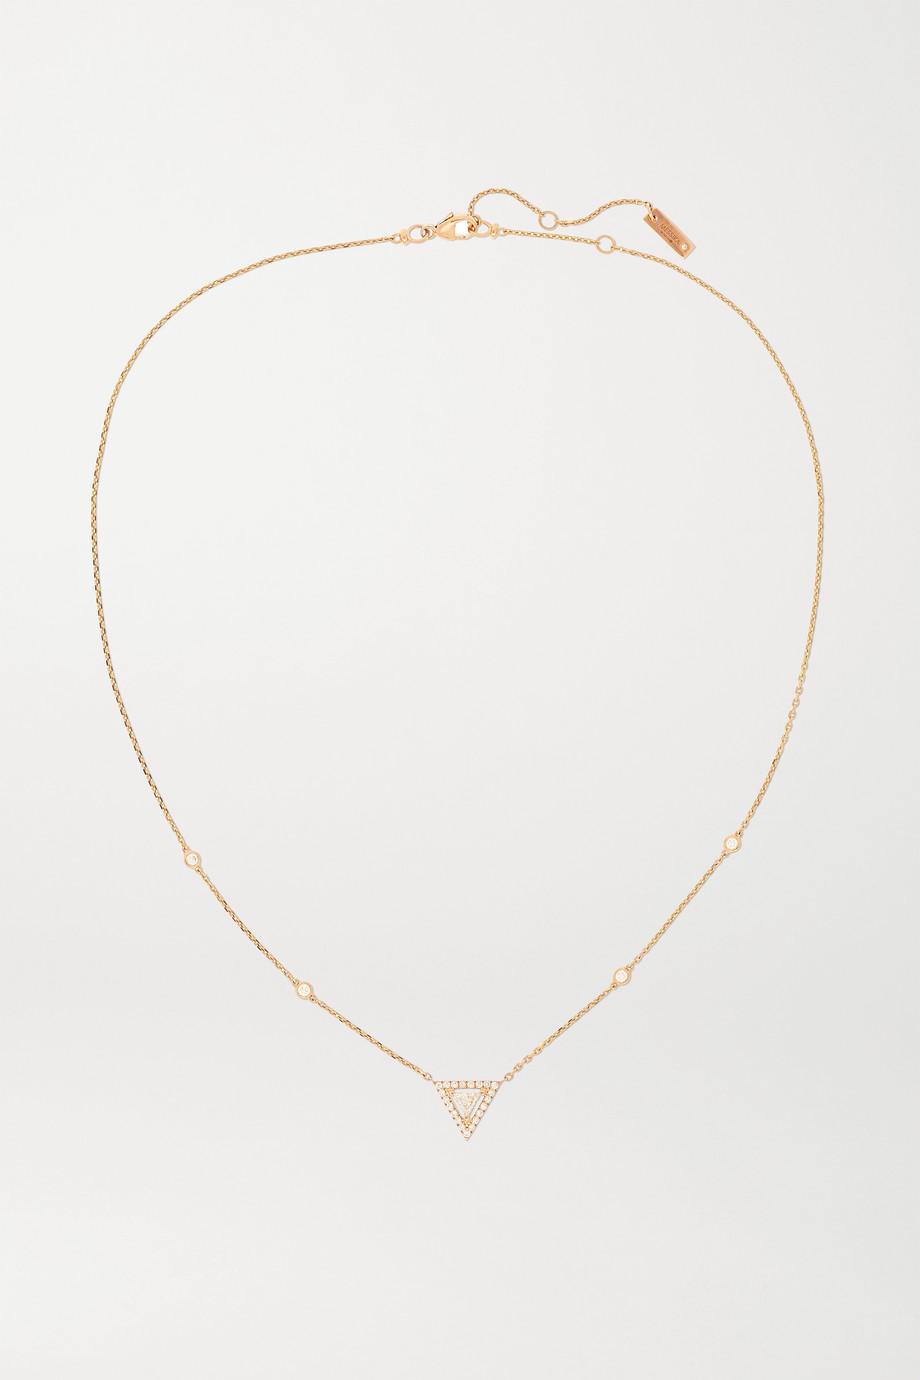 Messika Collier en or rose 18 carats et diamants Théa